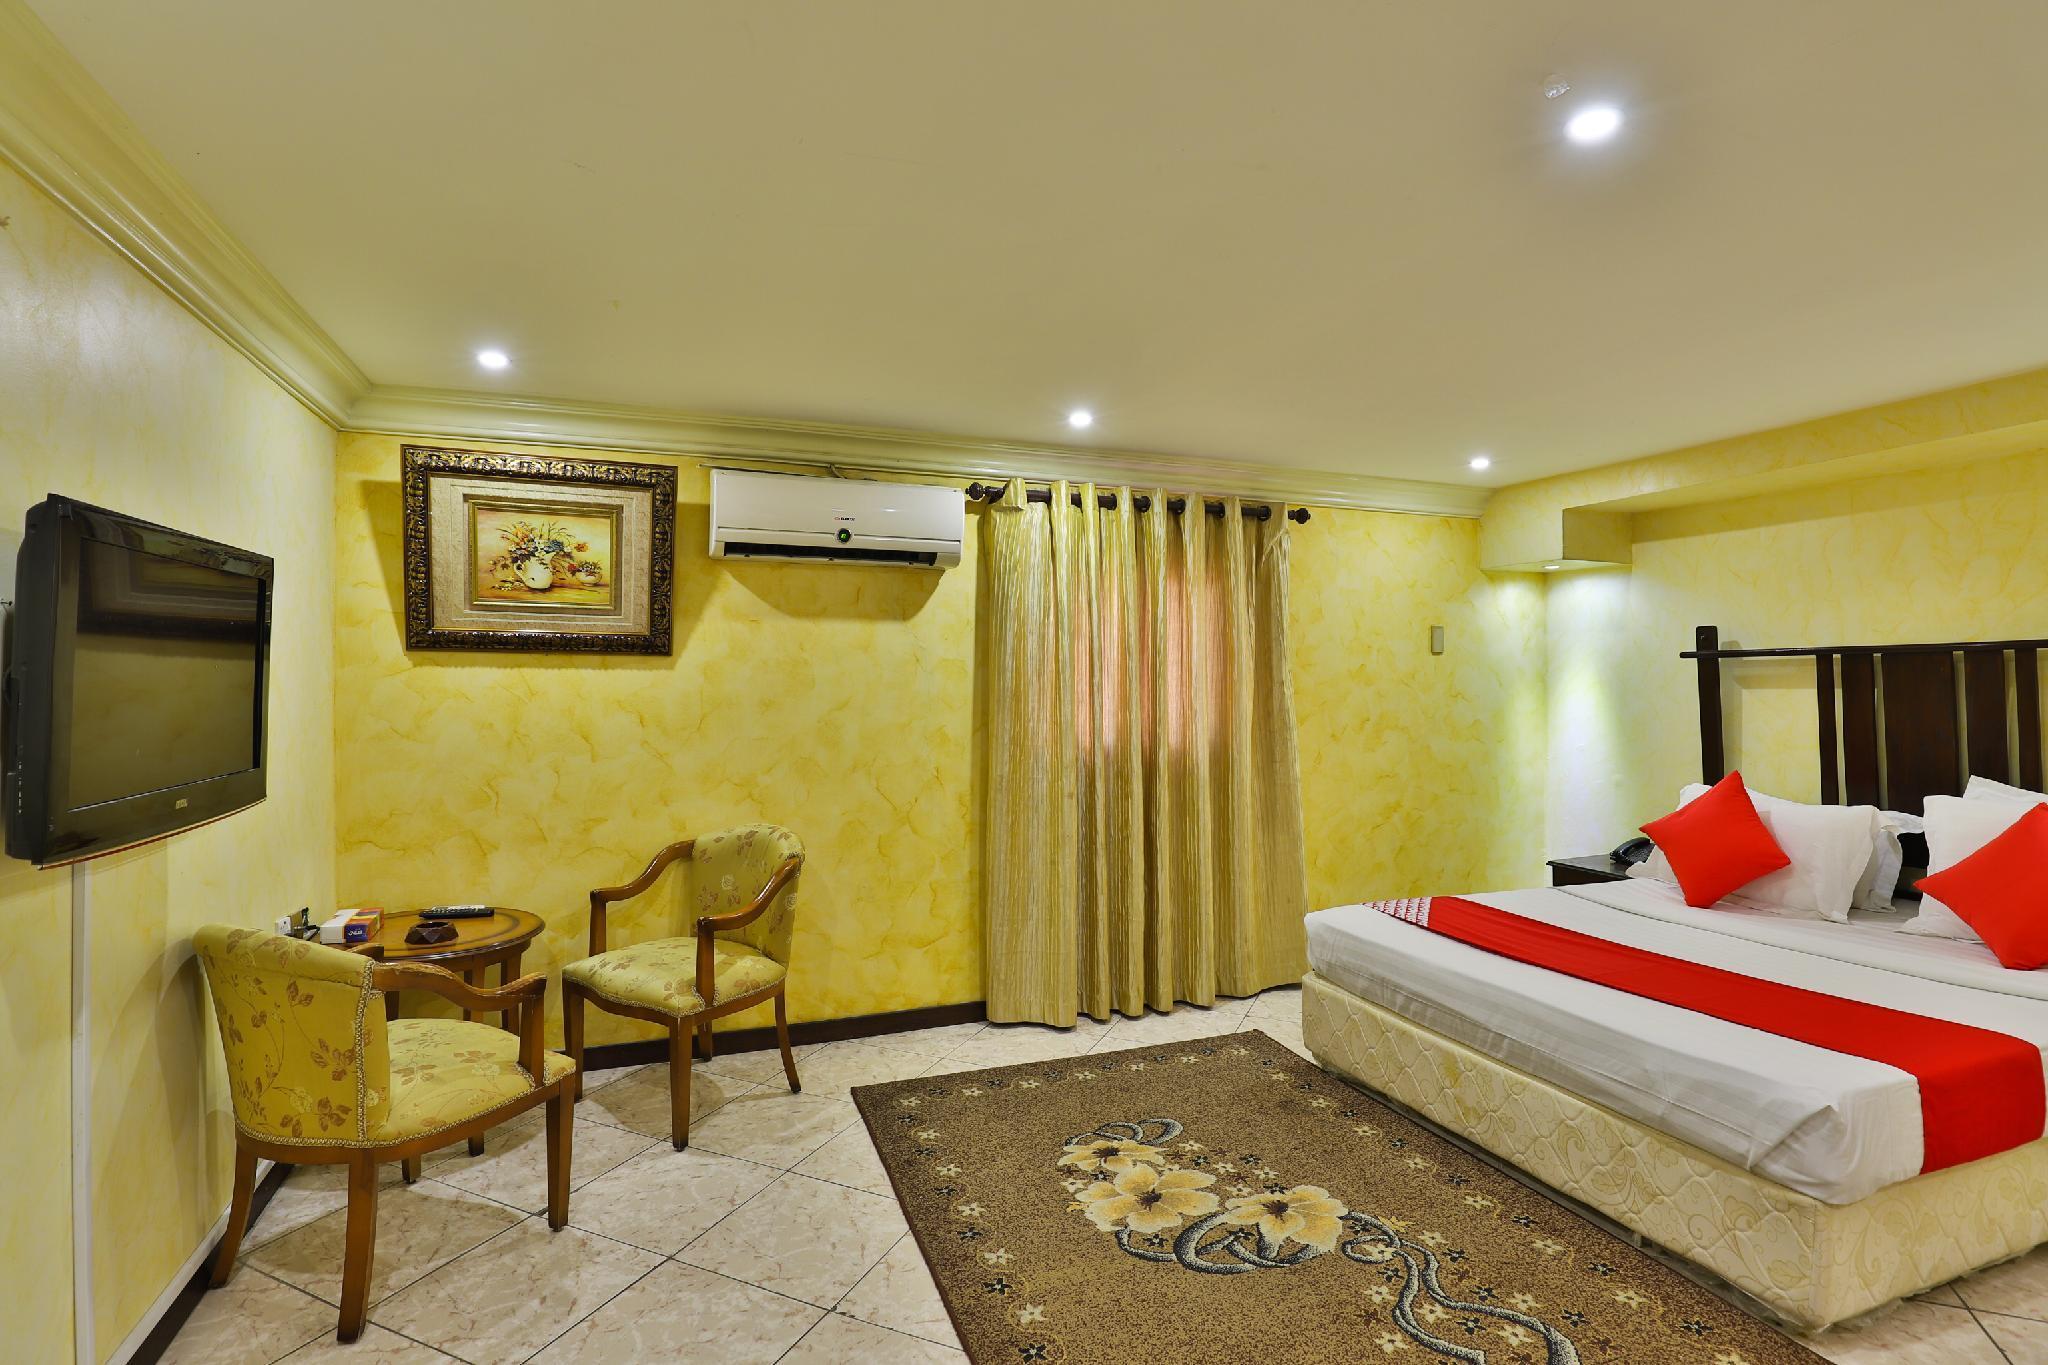 OYO 291 Dyafat Al Saati Furnished Apartments